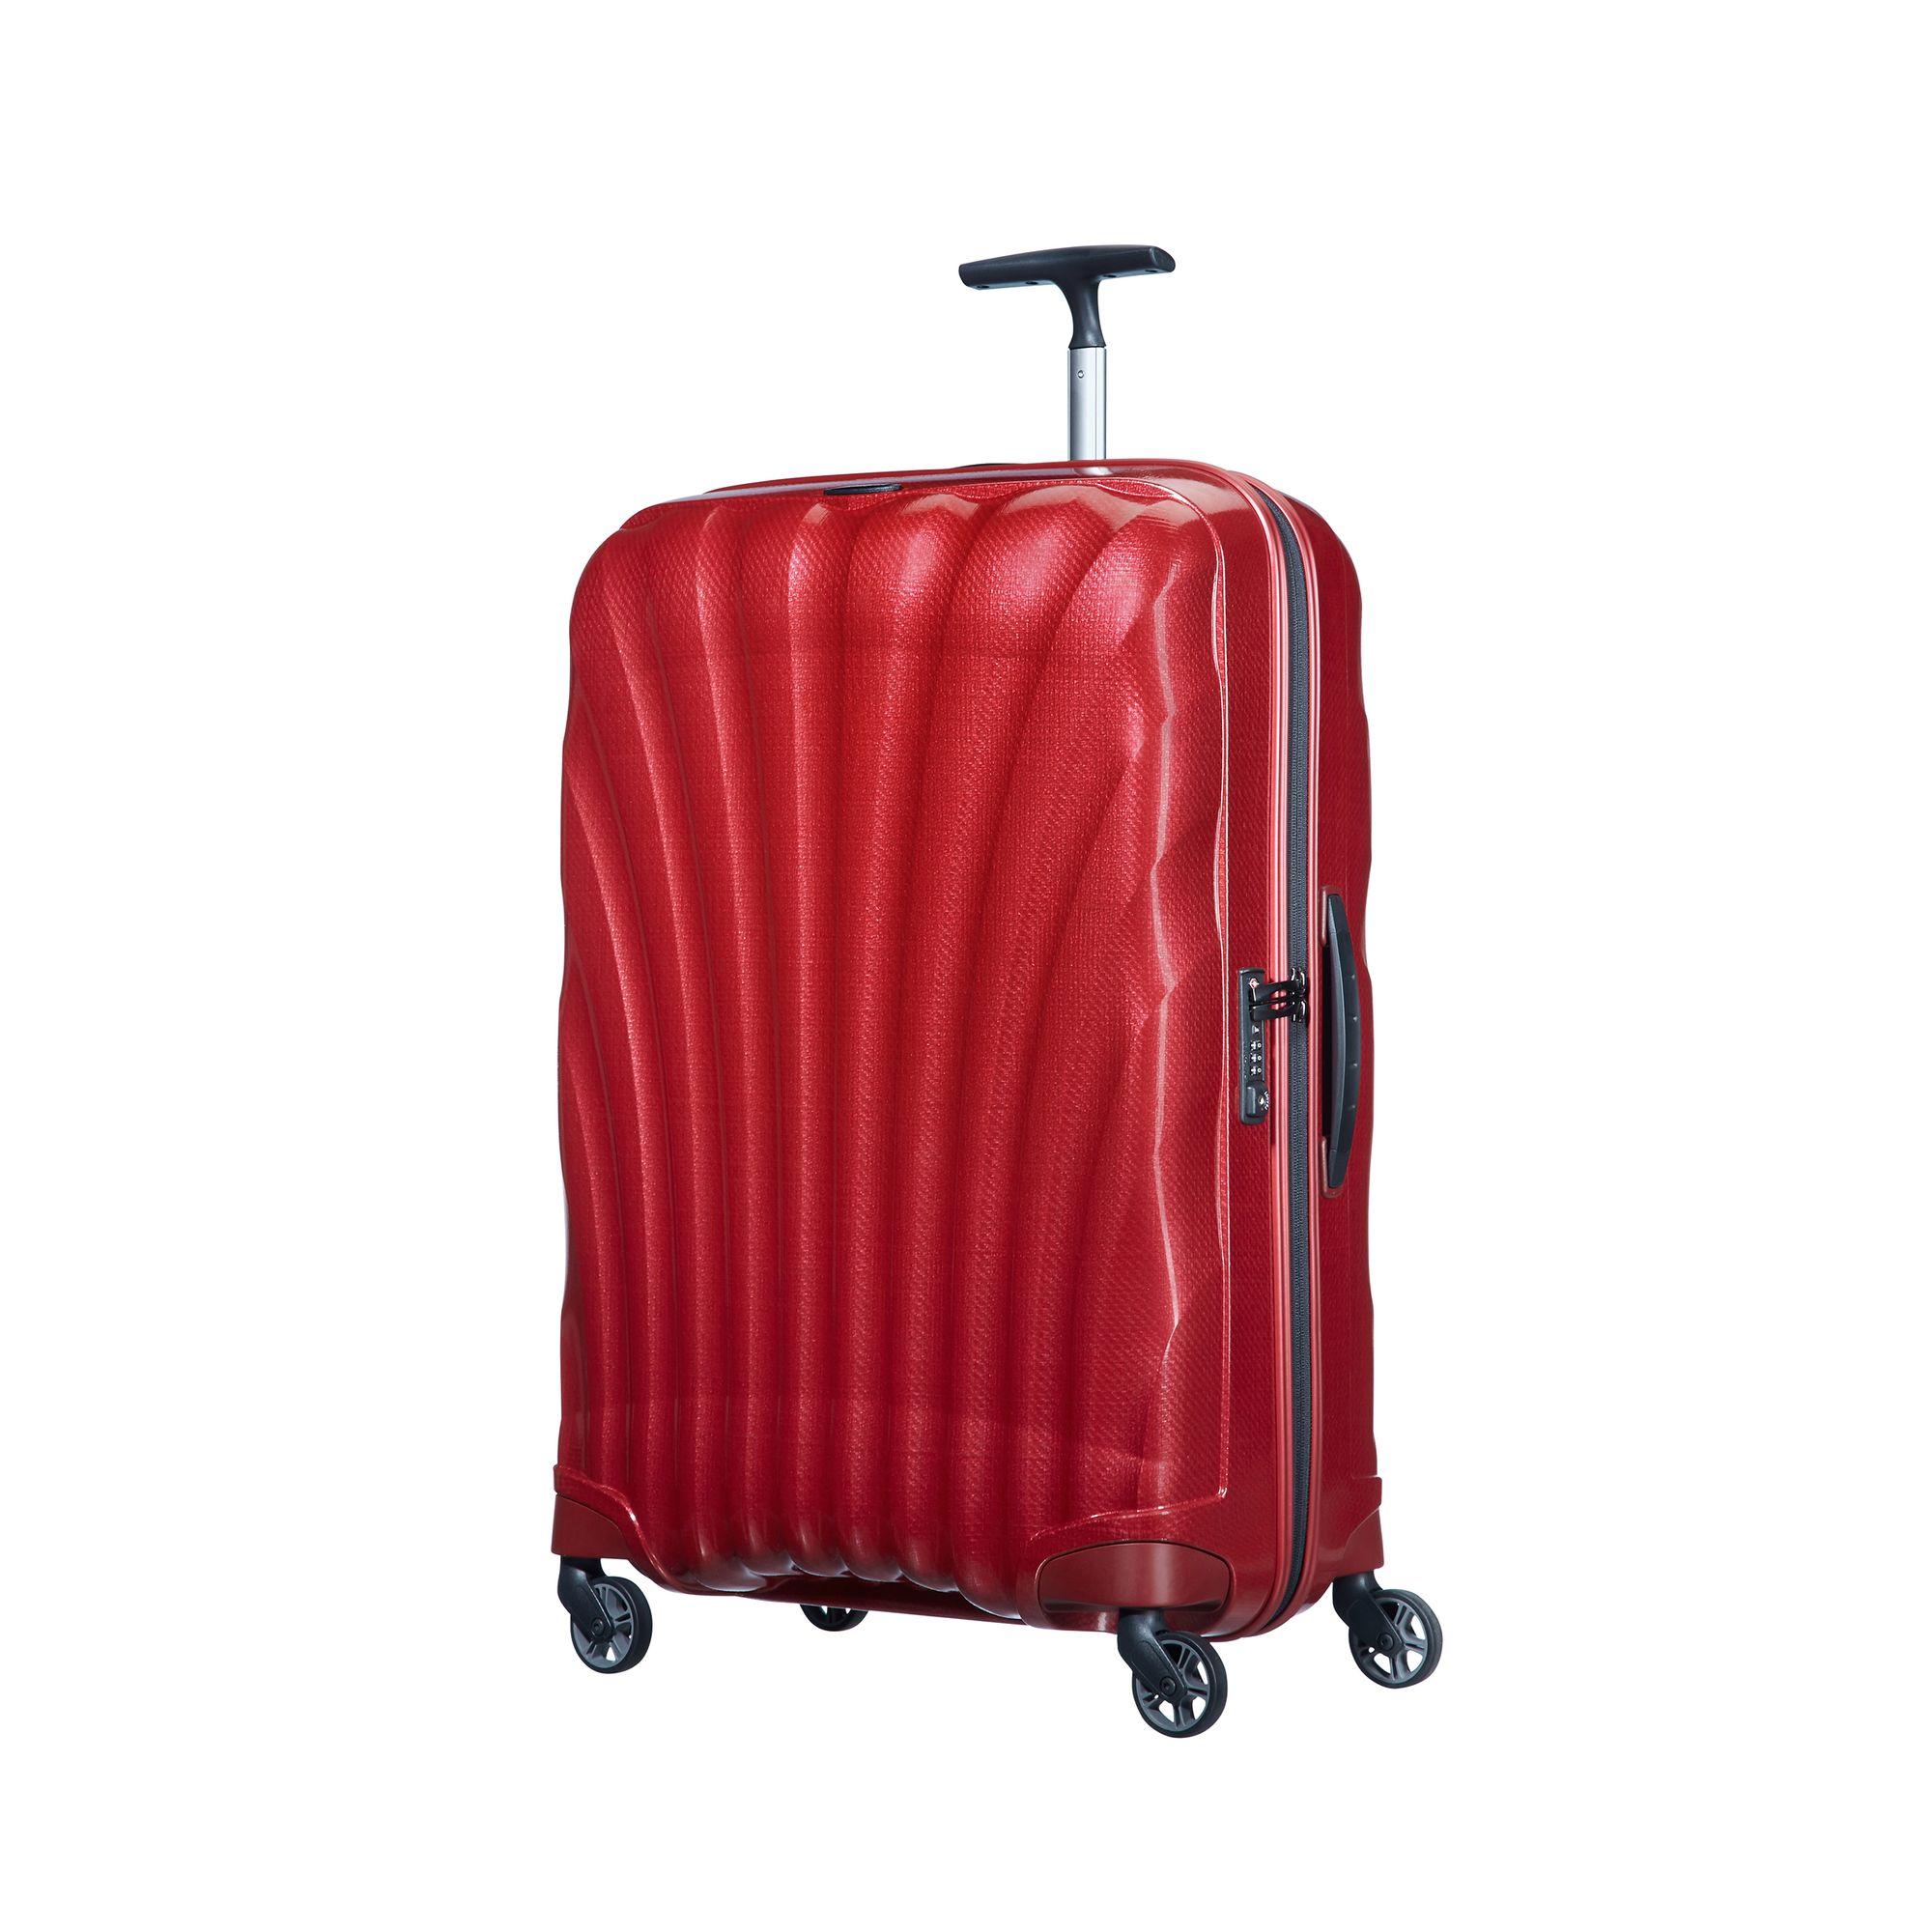 Samsonite Cosmolite hård resväska, 4 hjul, 69 cm, Röd